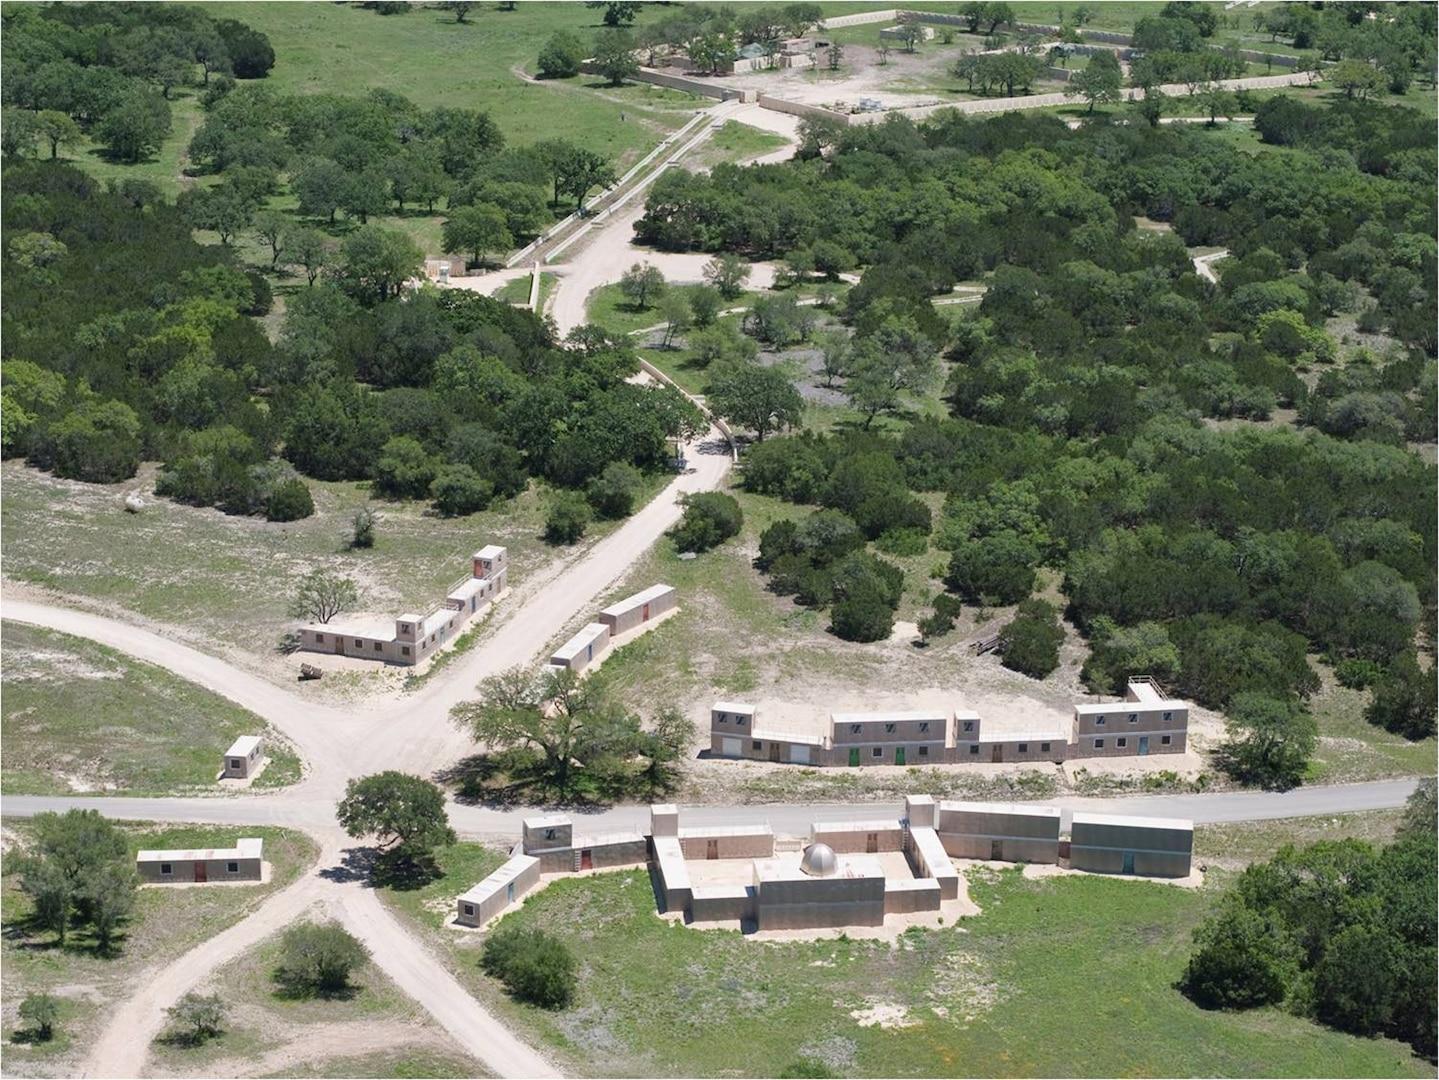 Joint Base San Antonio-Camp Bullis sits astride the Southern Edwards Plateau on the Northwest edge of San Antonio.